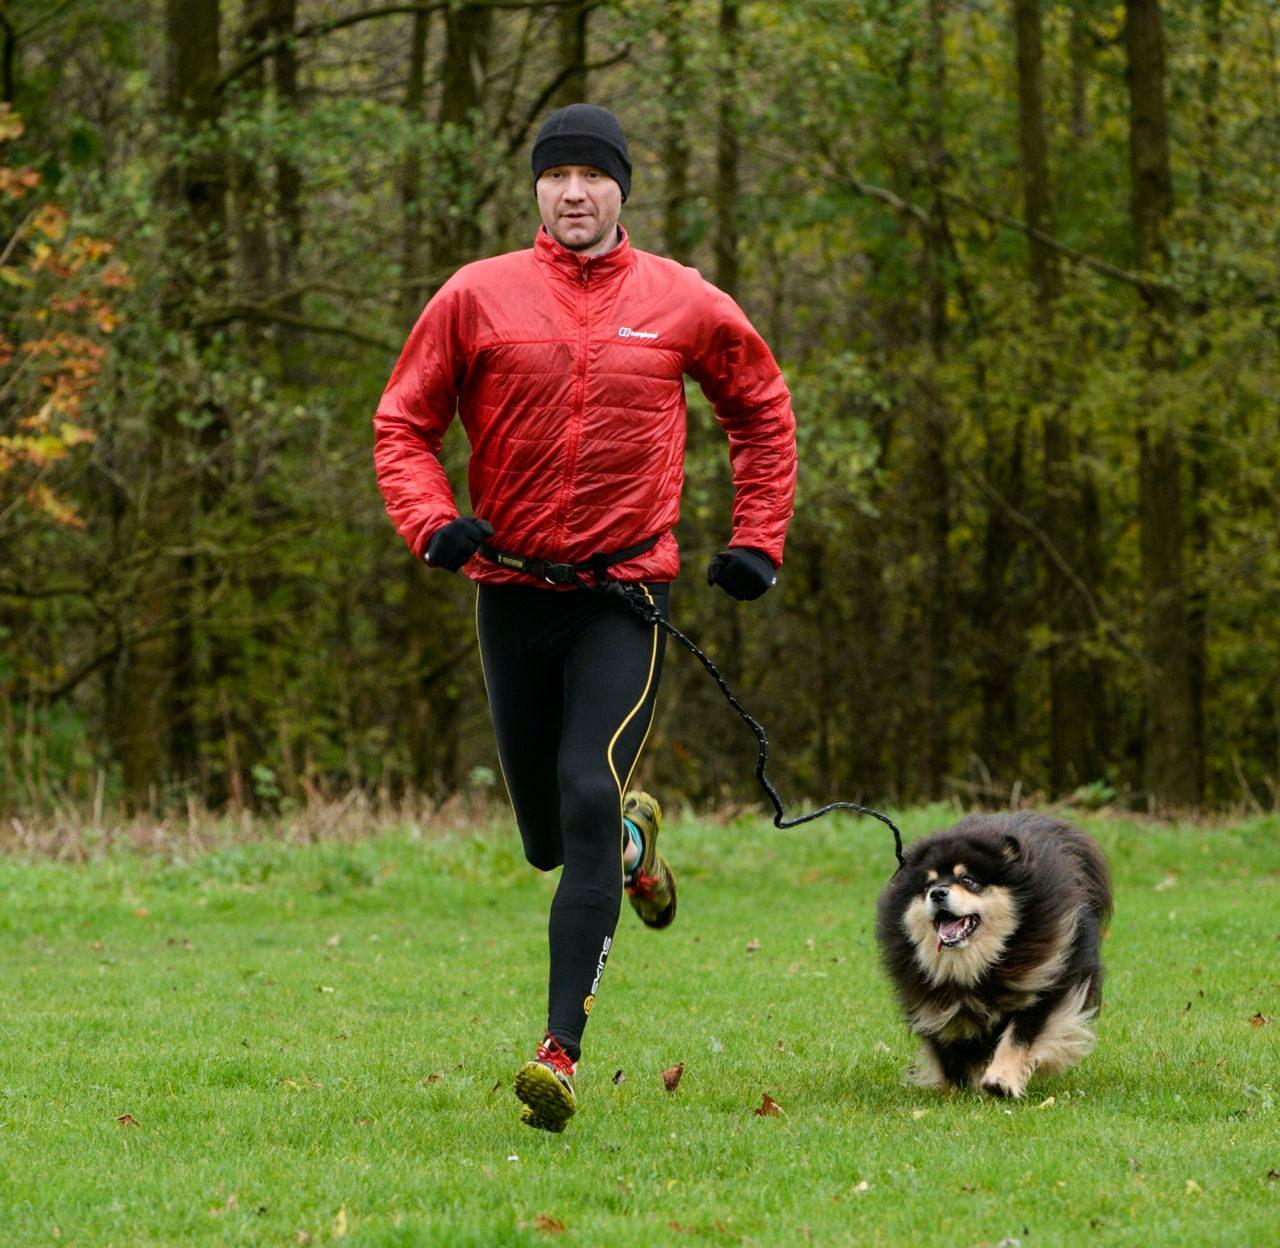 Triathlete running with his dog